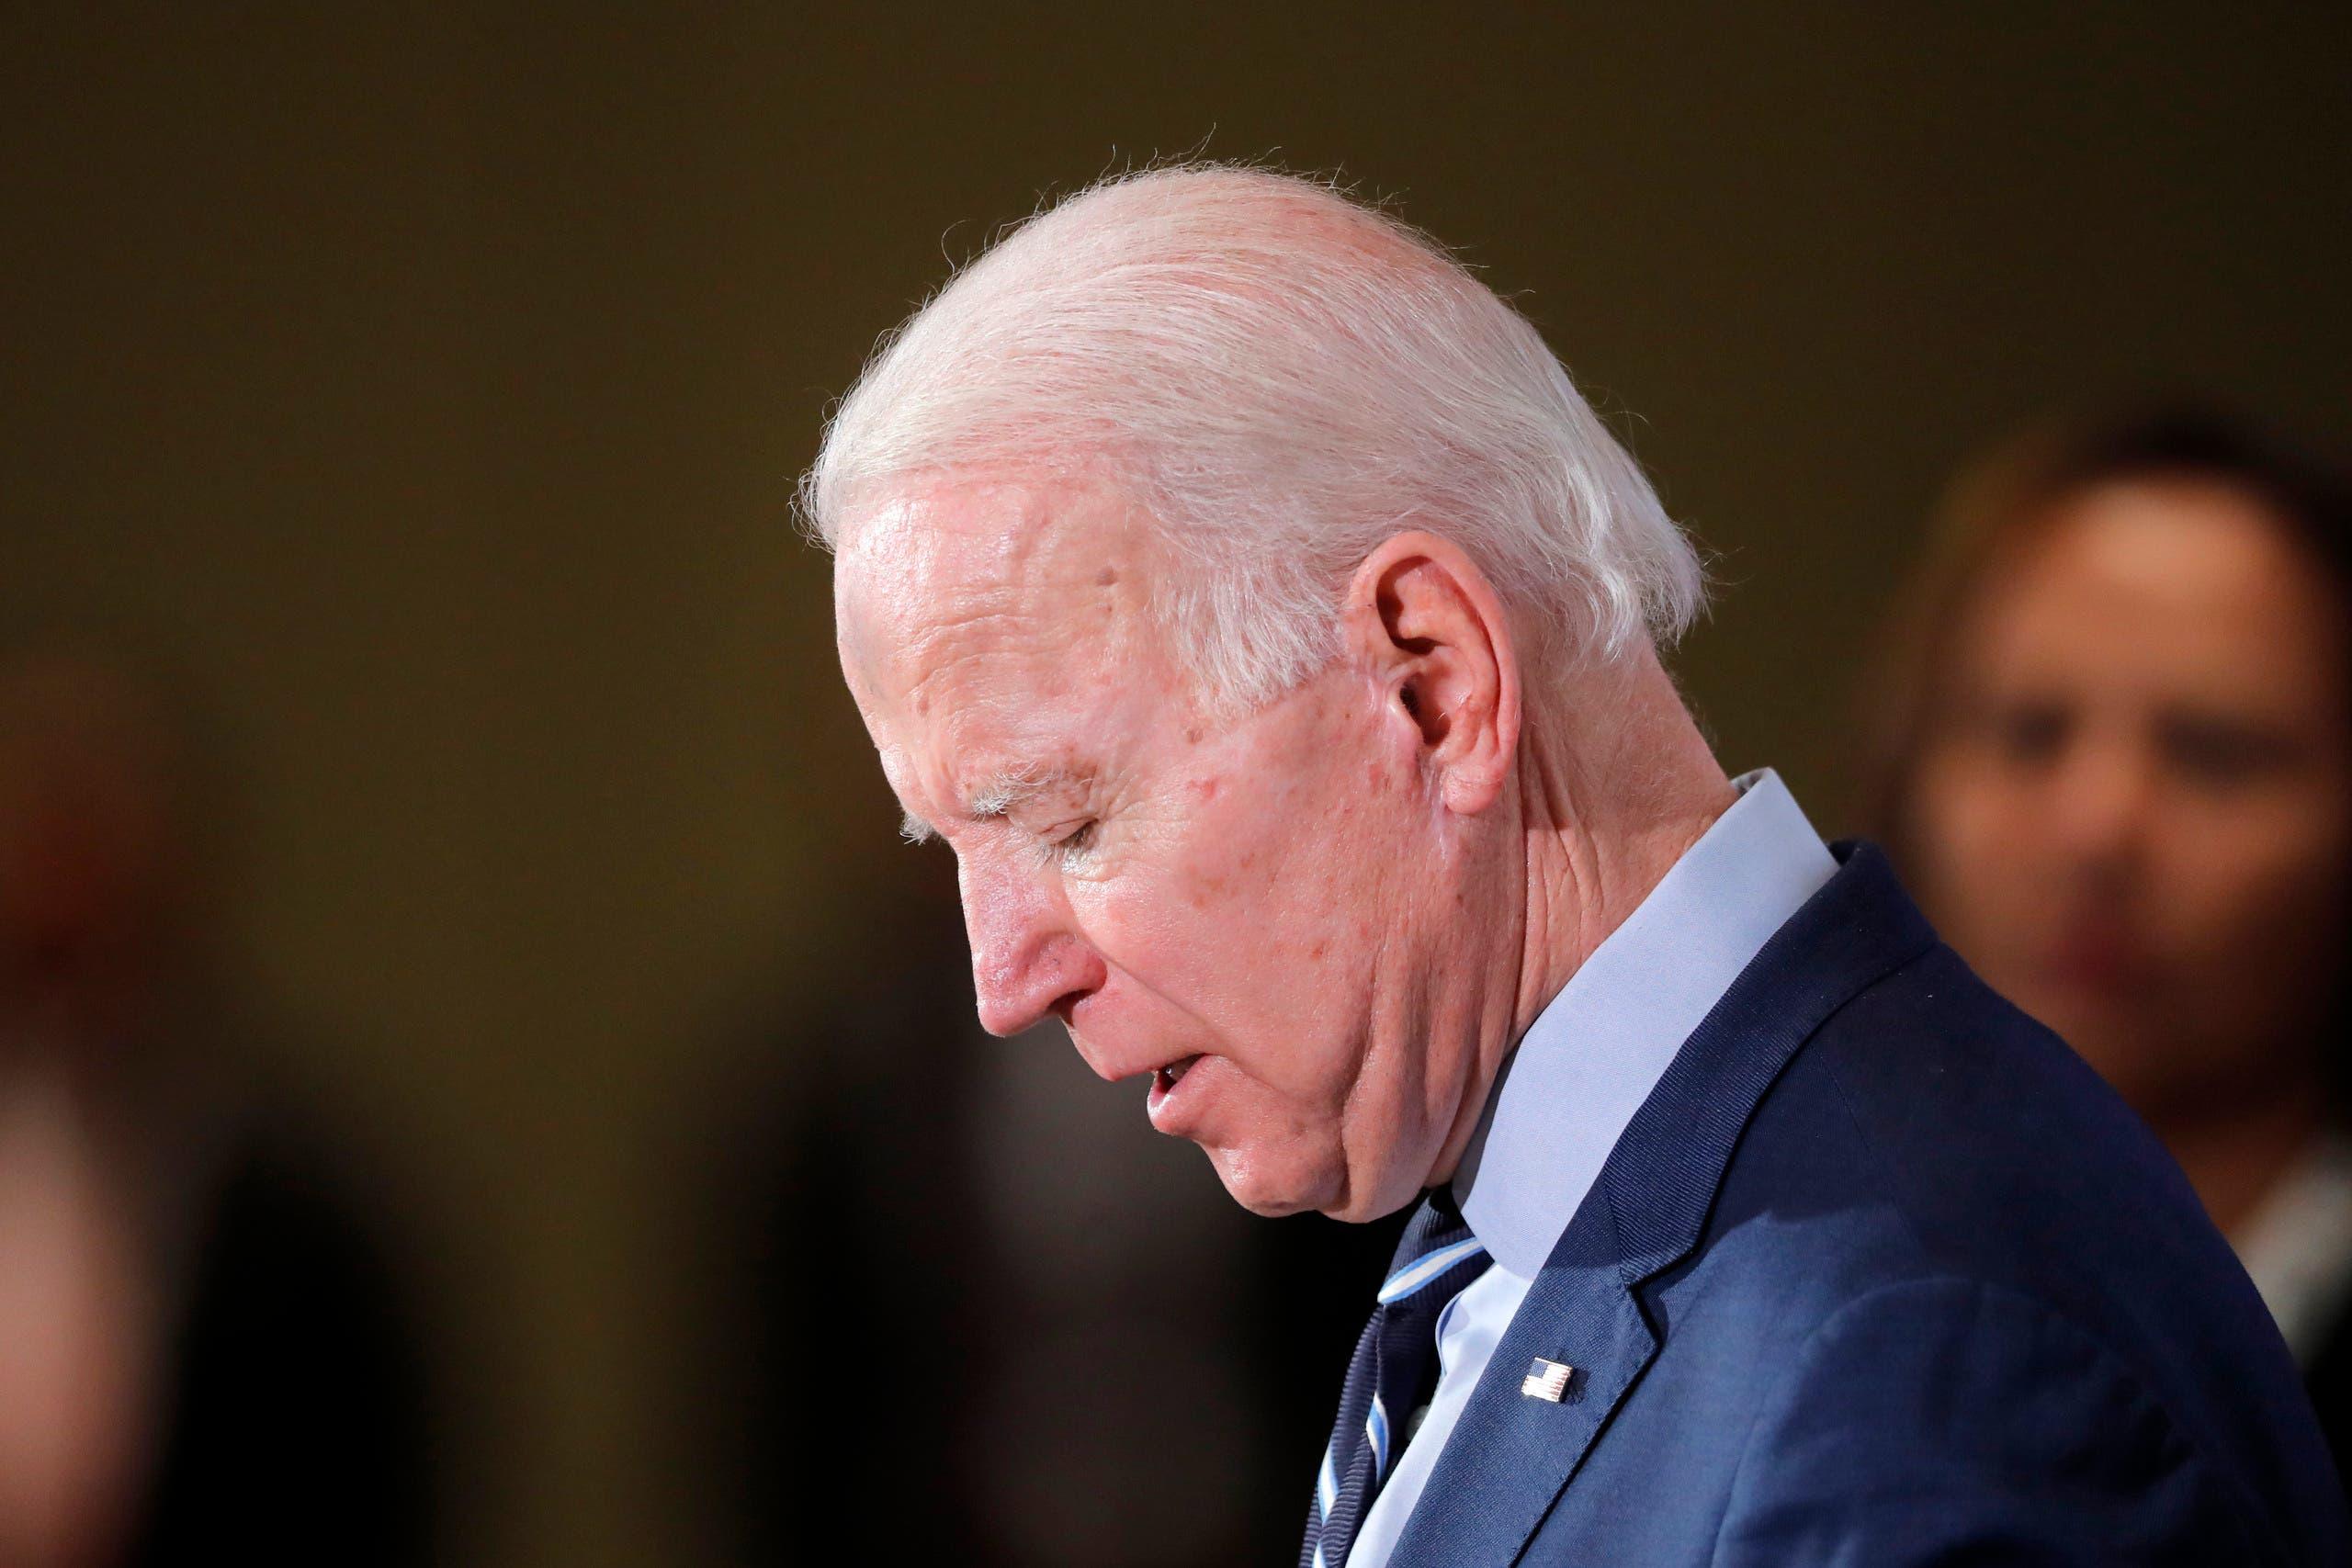 Democratic presidential candidate former Vice President Joe Biden in South Carolina on Feb. 26, 2020. (AP)